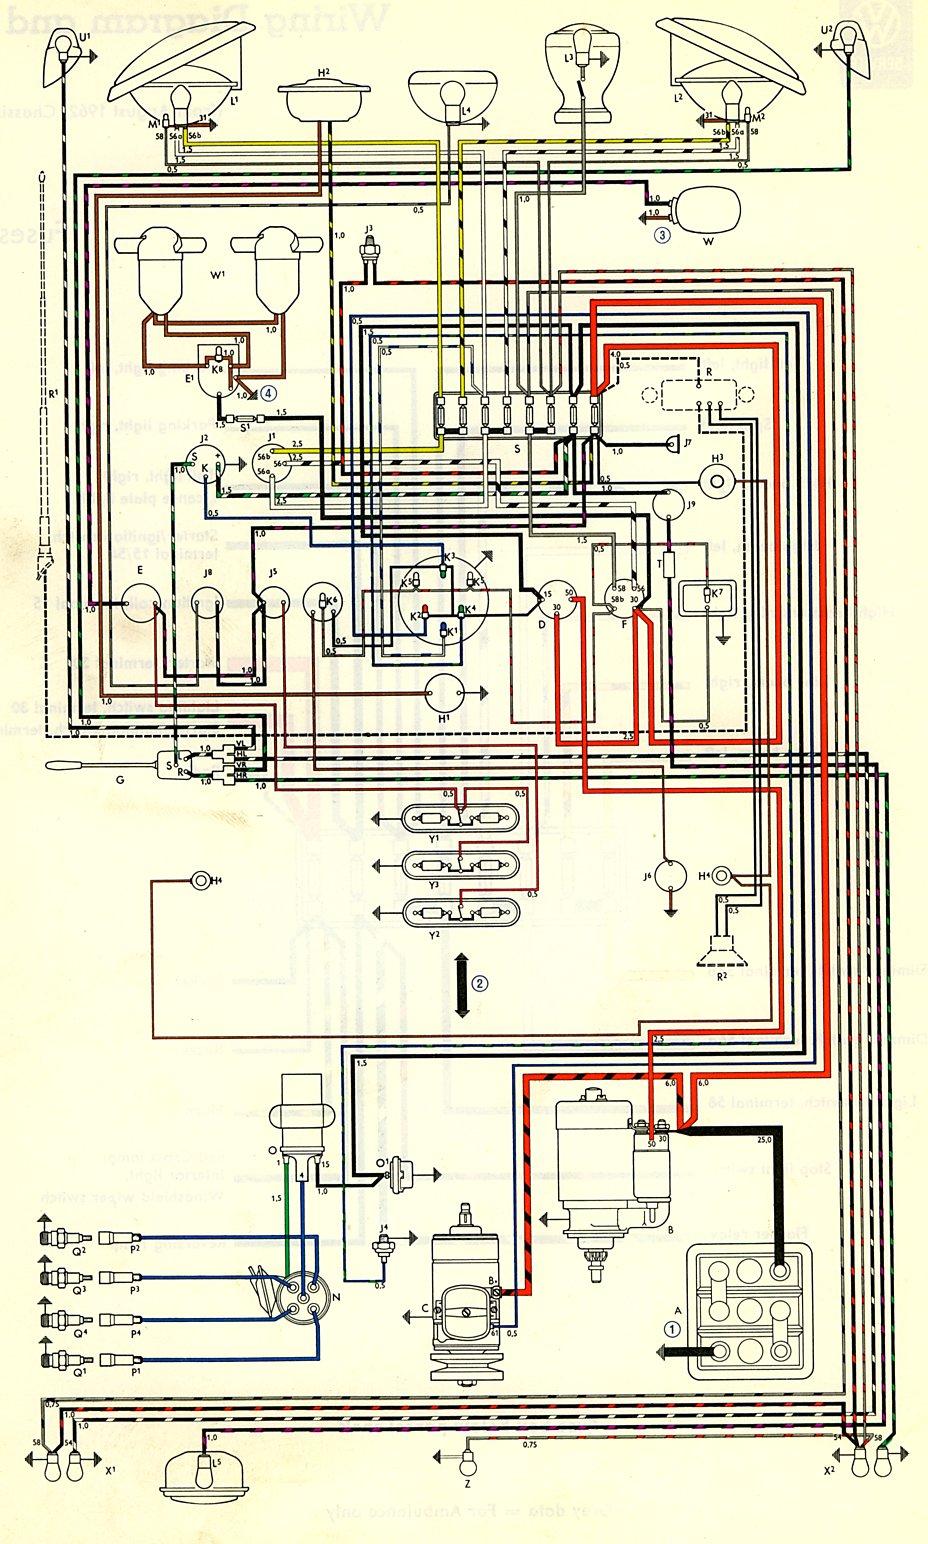 1963 Chevy Starter Wiring Diagram 1963 Bus Wiring Diagram Usa Thegoldenbug Com